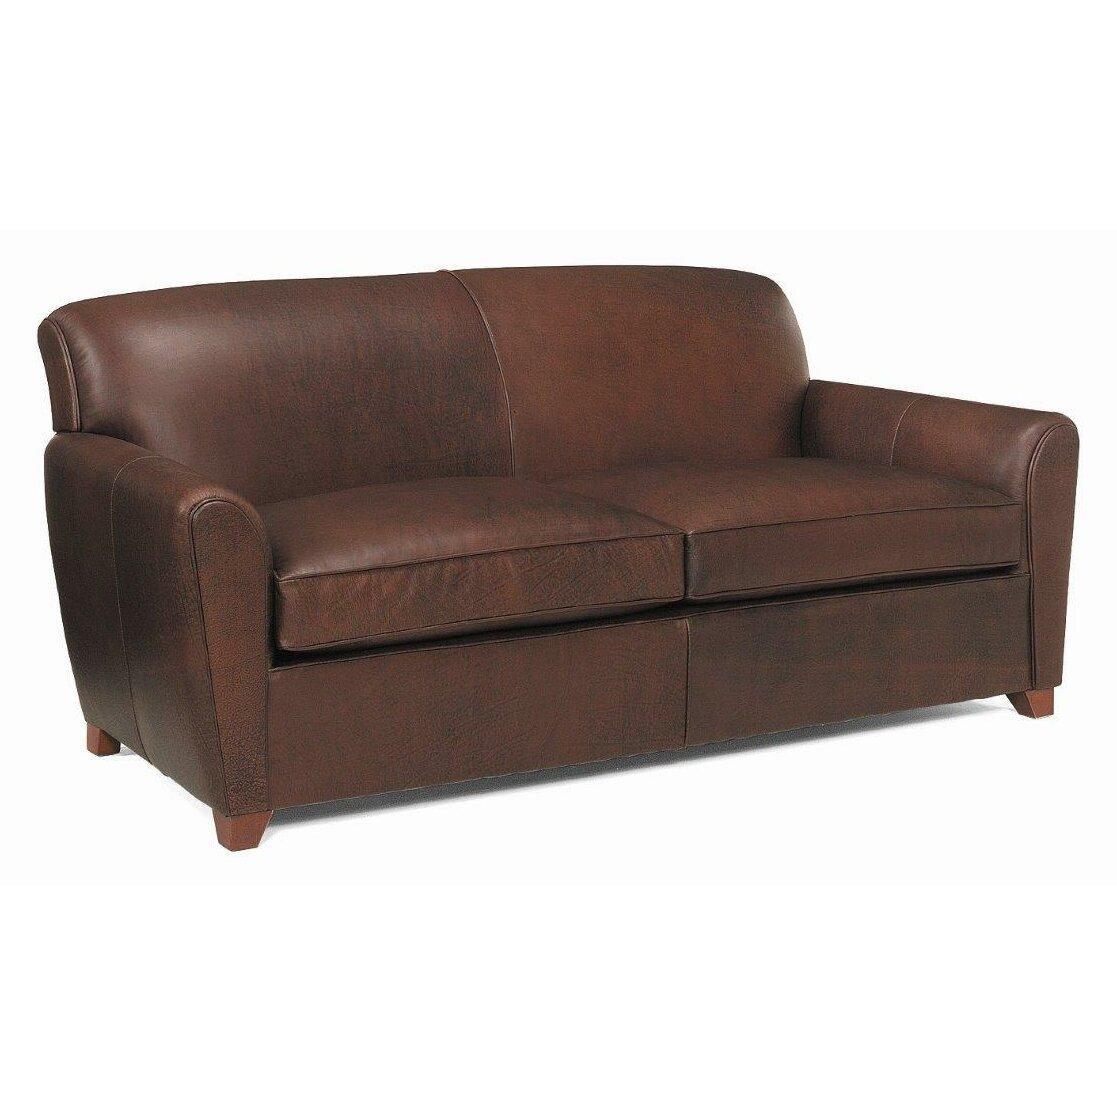 Leathercraft Picasso Leather Sofa Wayfair